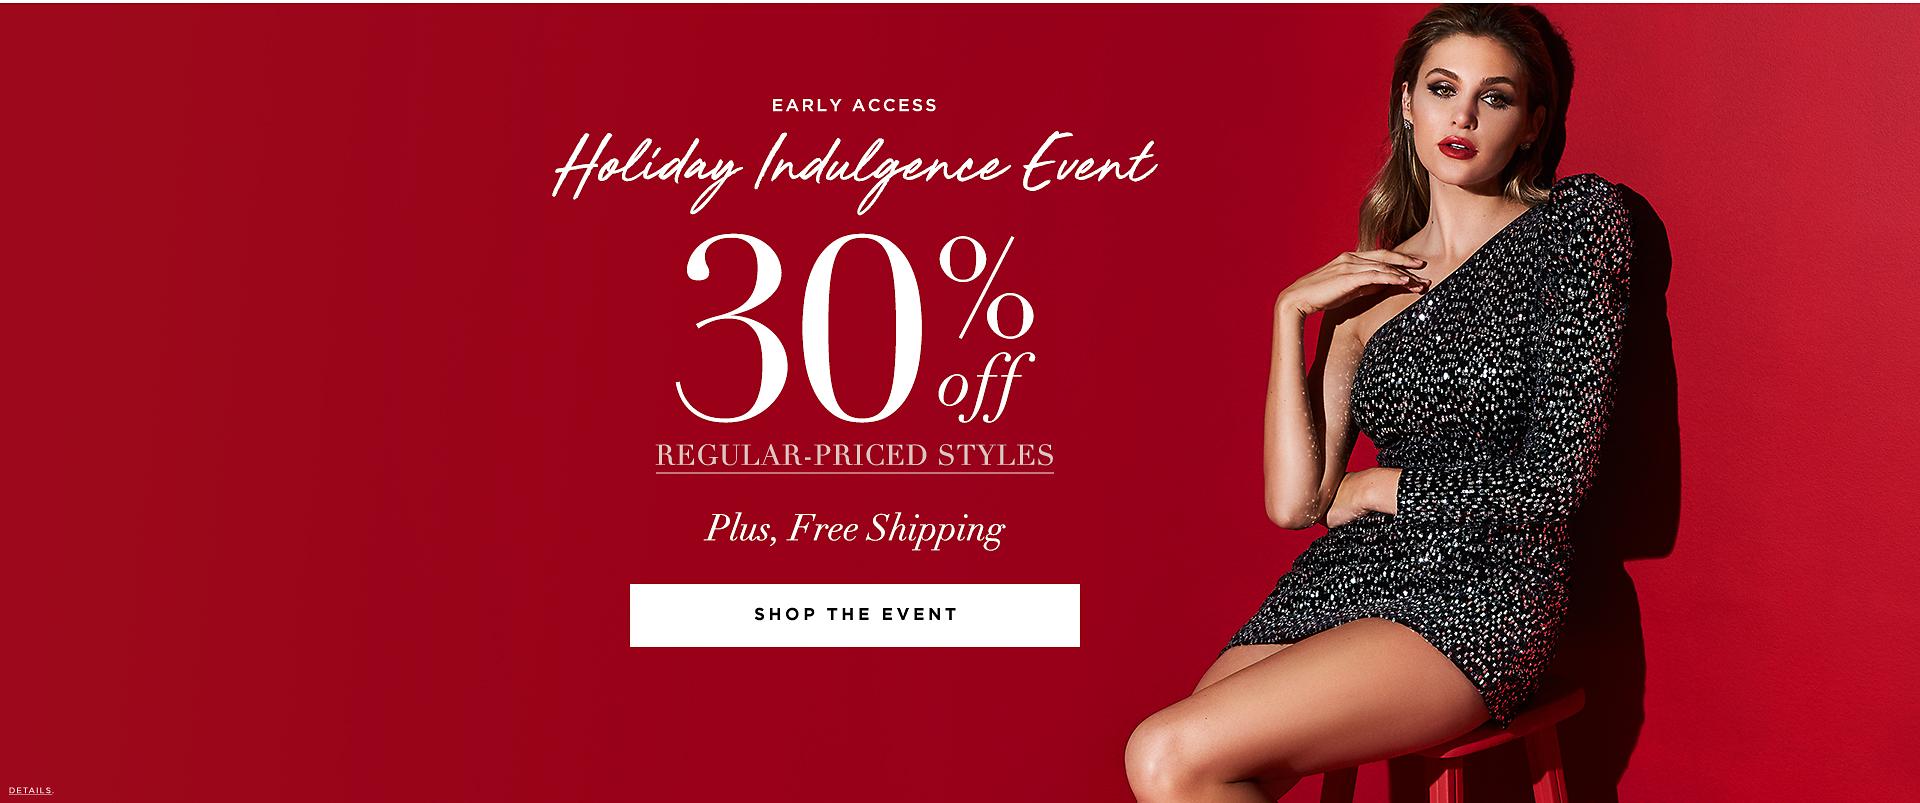 HOLIDAY INDULGENCE EVENT 30% Off